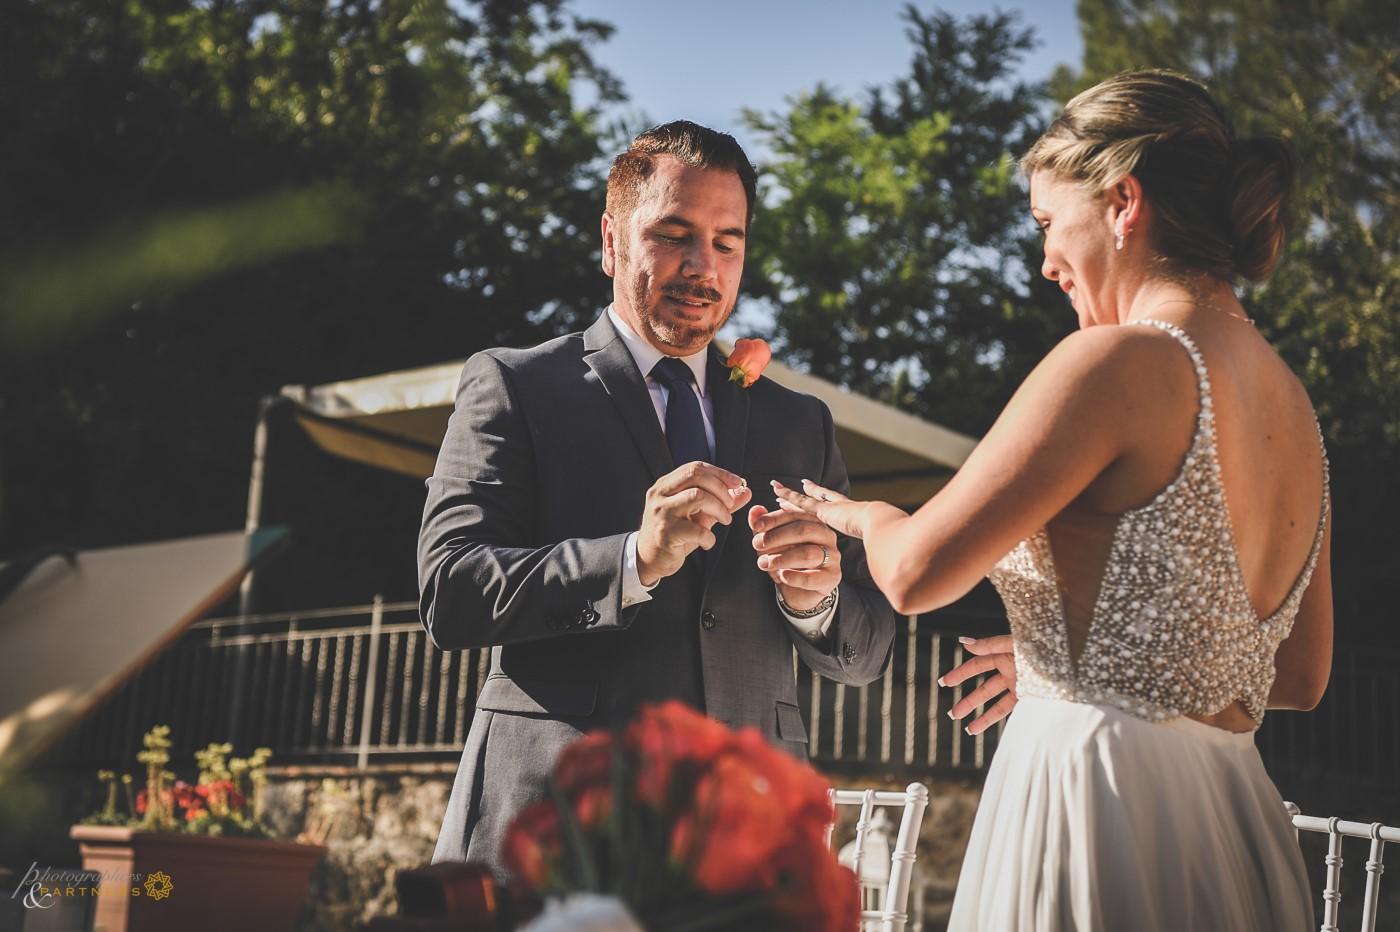 The groom's wedding ring.